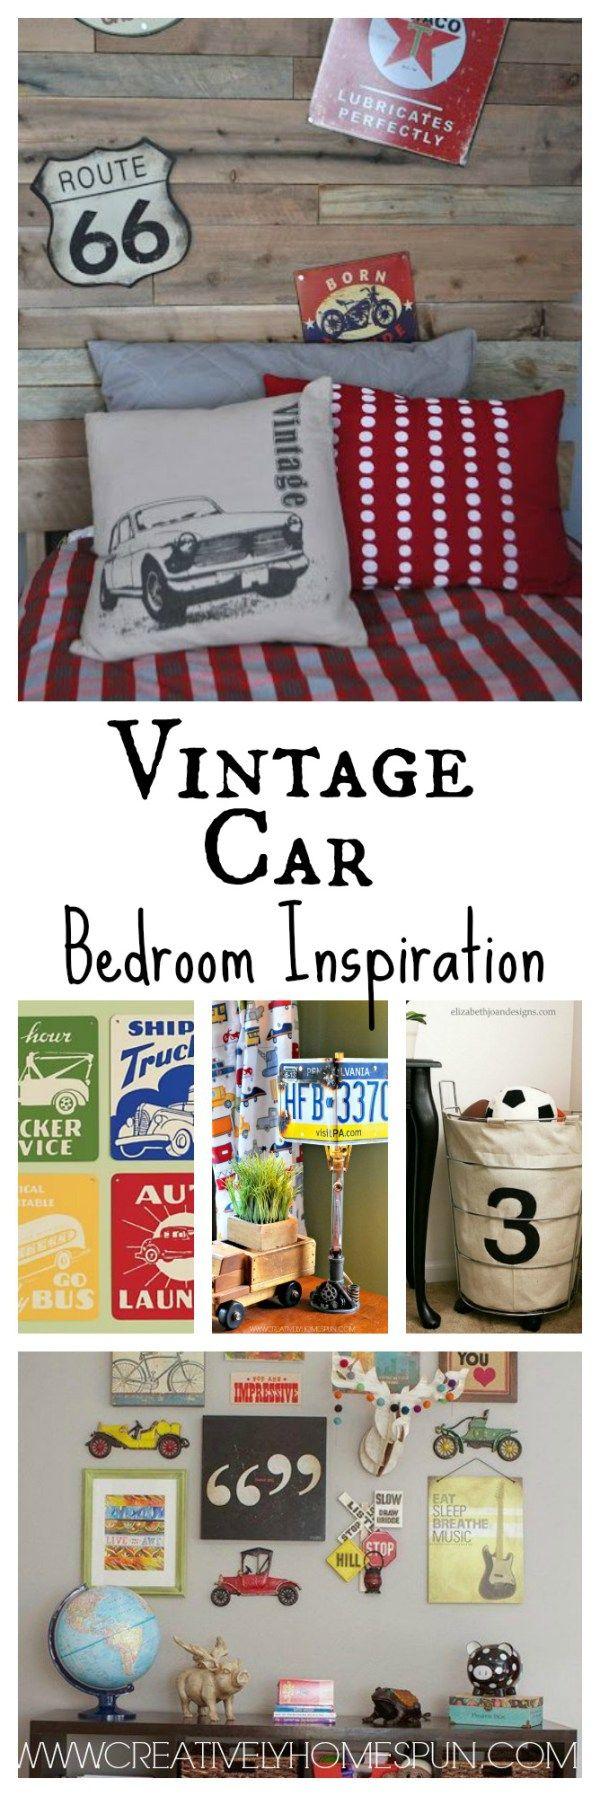 Vintage Car Bedroom Inspiration #boysroom #kidsroom #bedroom #diydecor